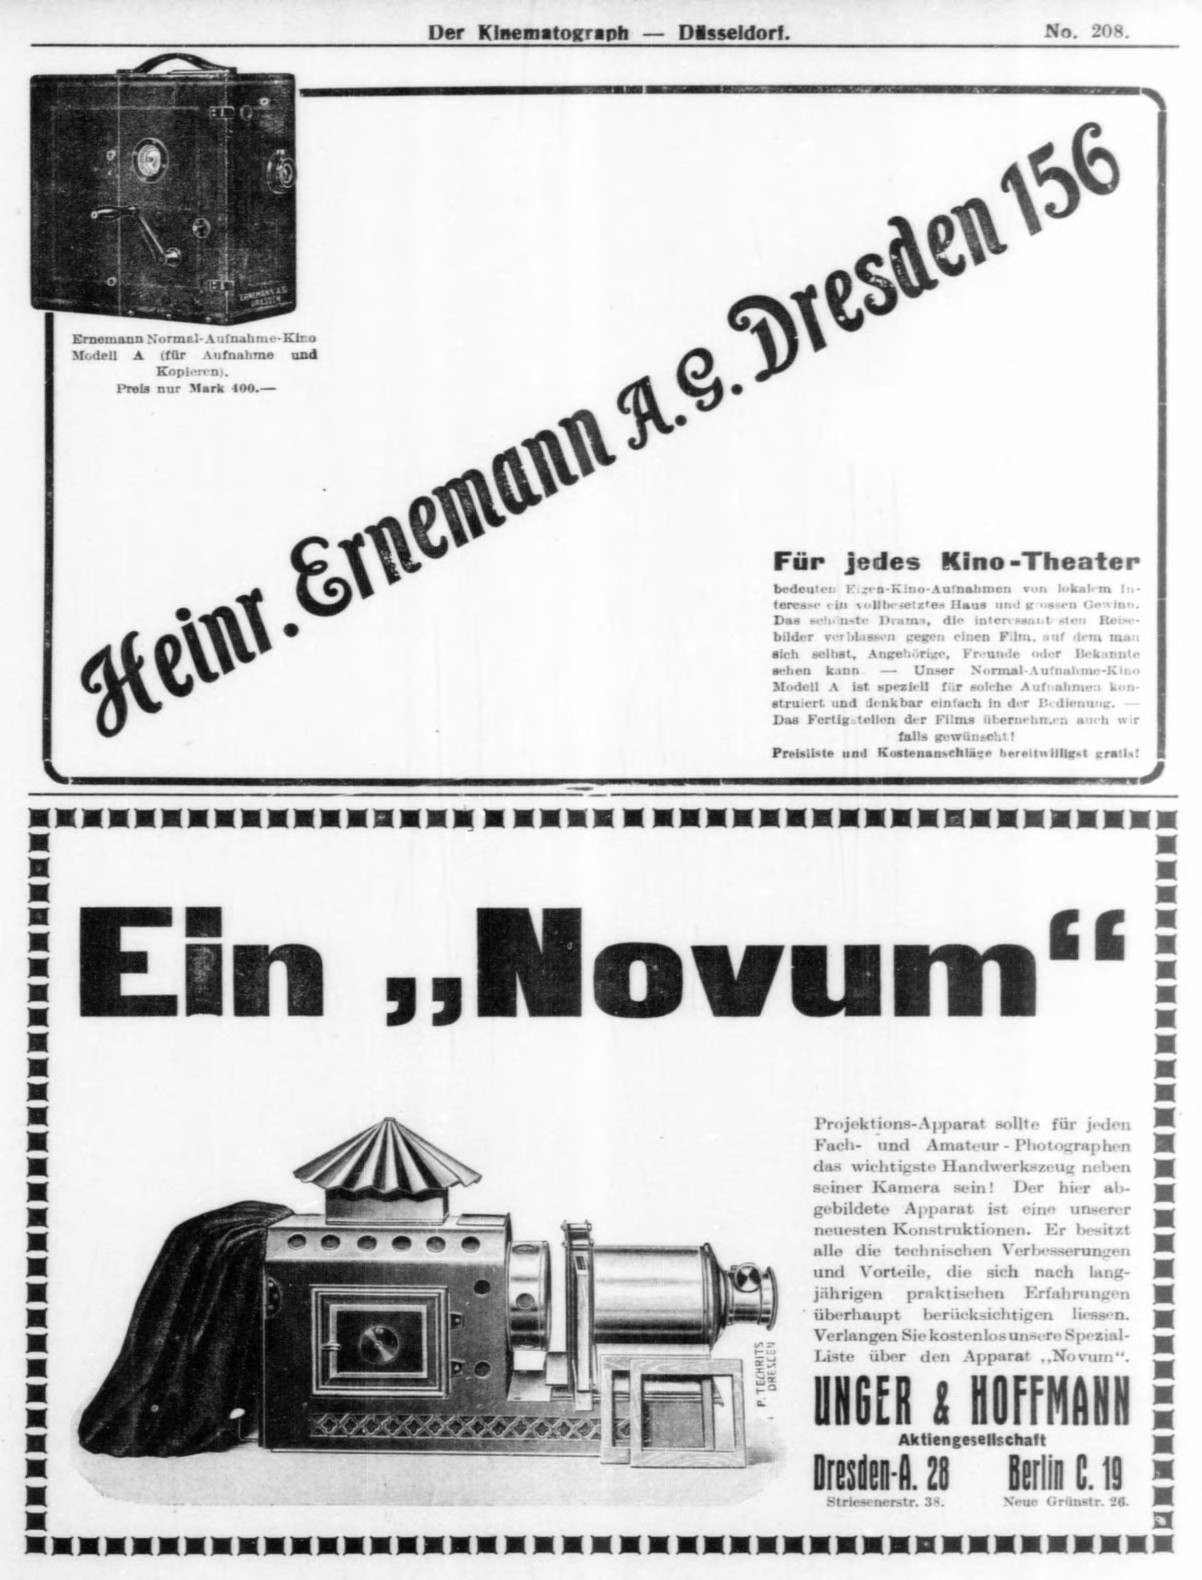 Kinematograph04-1910-12_jp2.zip&file=kinematograph04-1910-12_jp2%2fkinematograph04-1910-12_0066